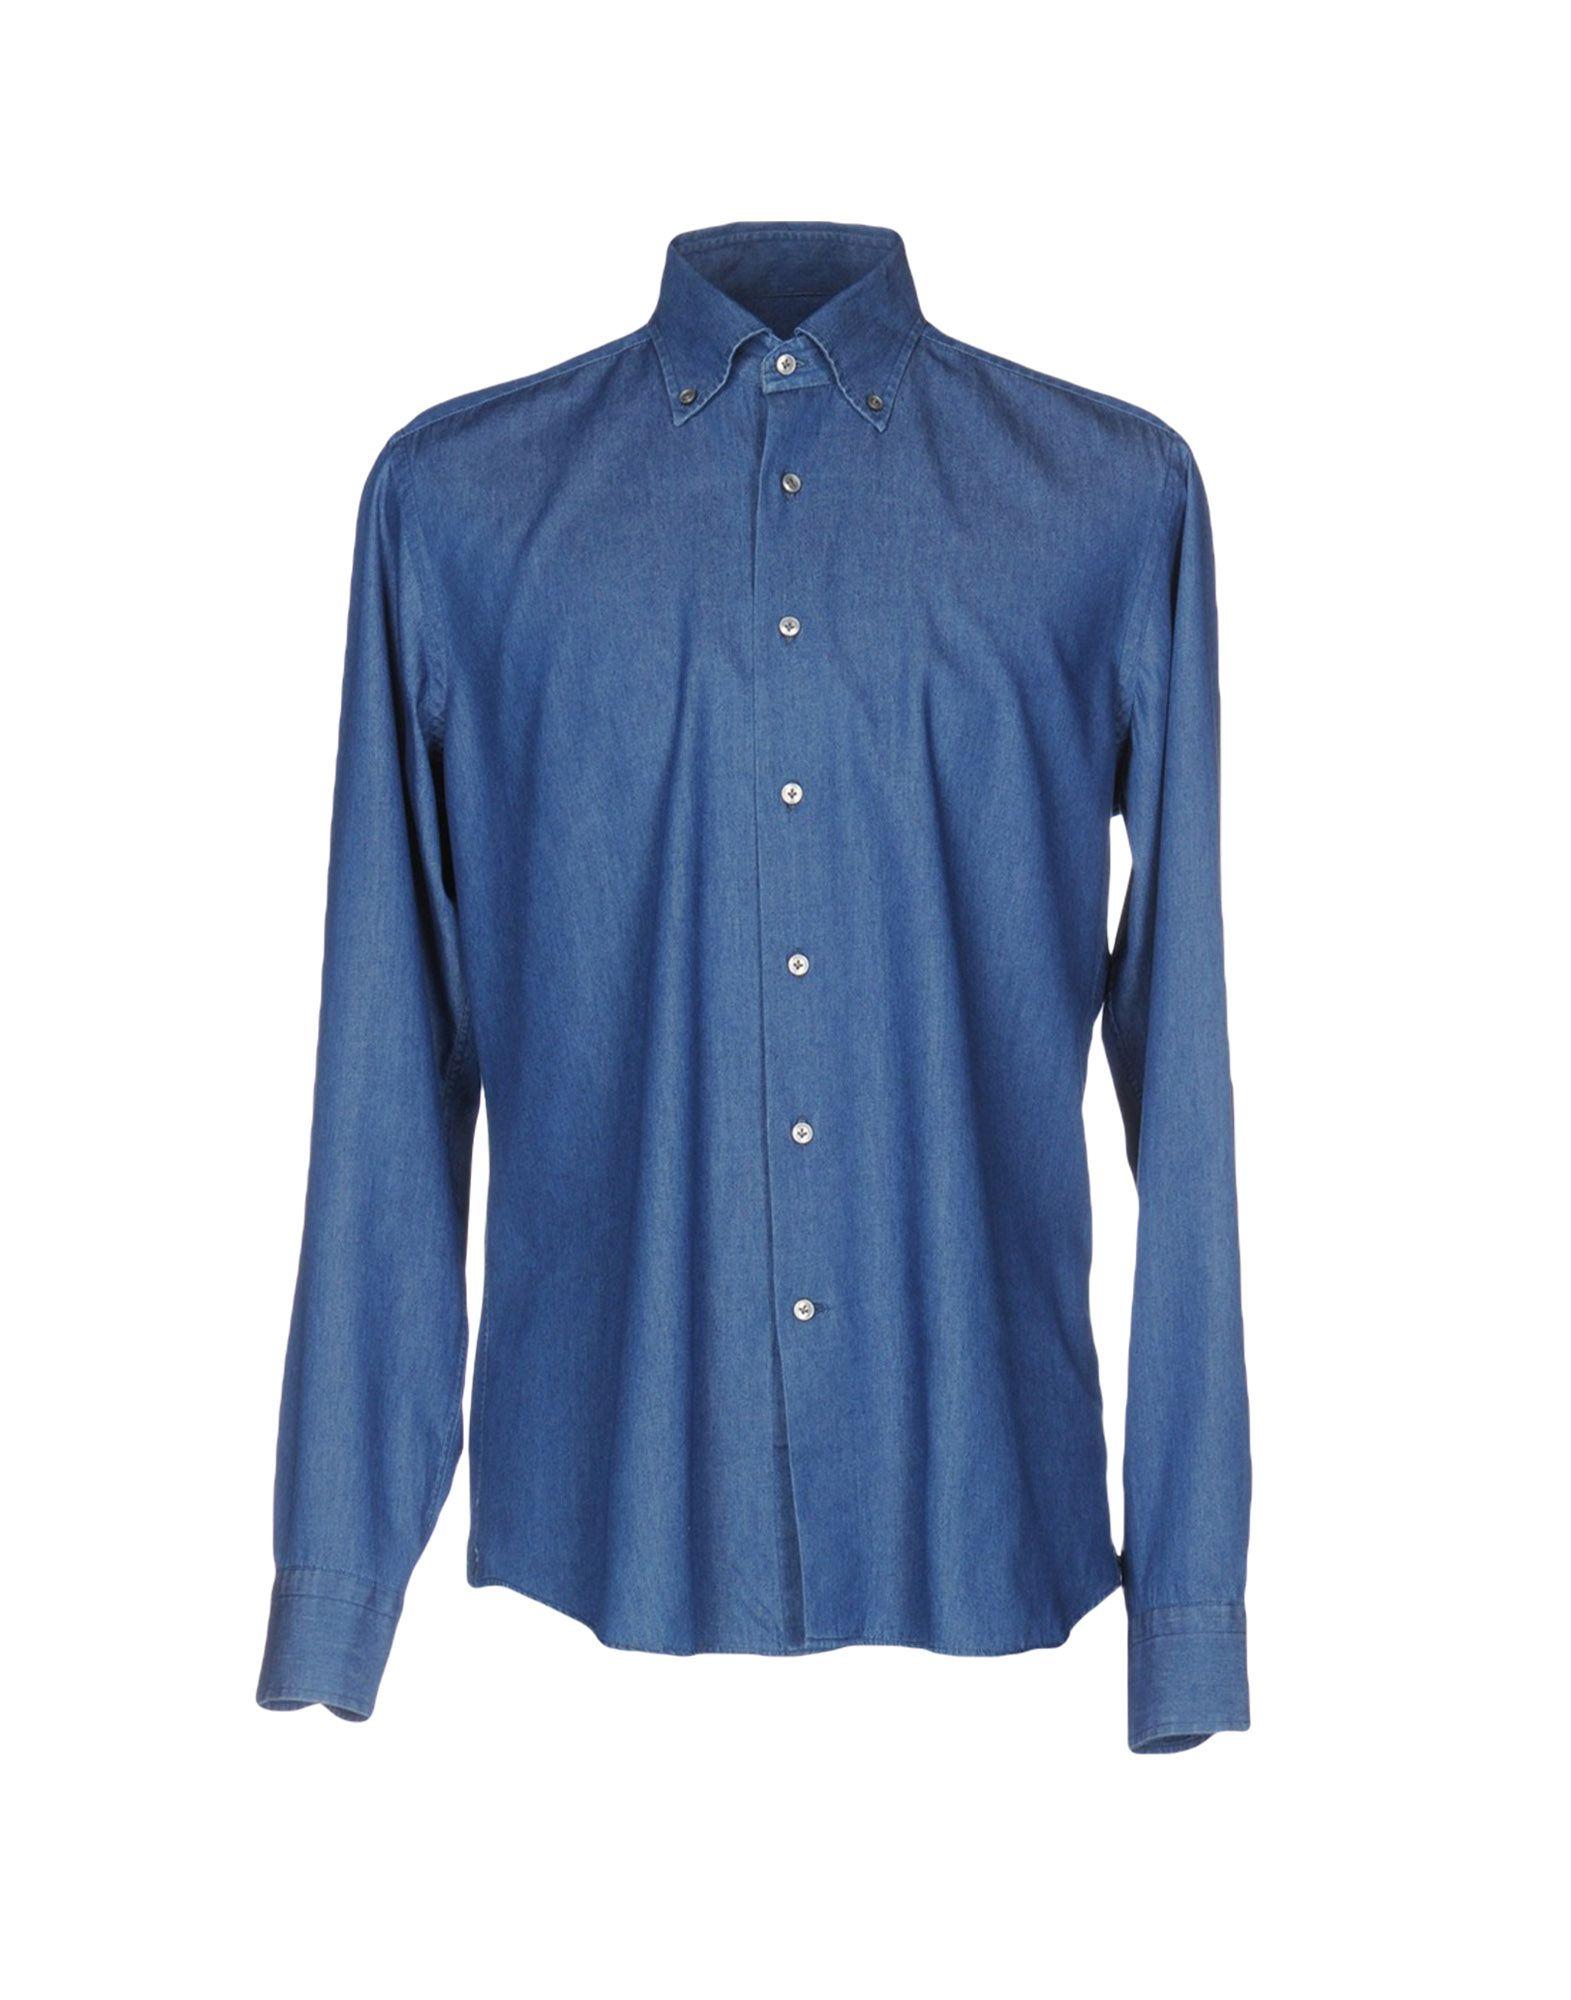 TT CAMICERIA DAL 1938 Джинсовая рубашка gletcher tt